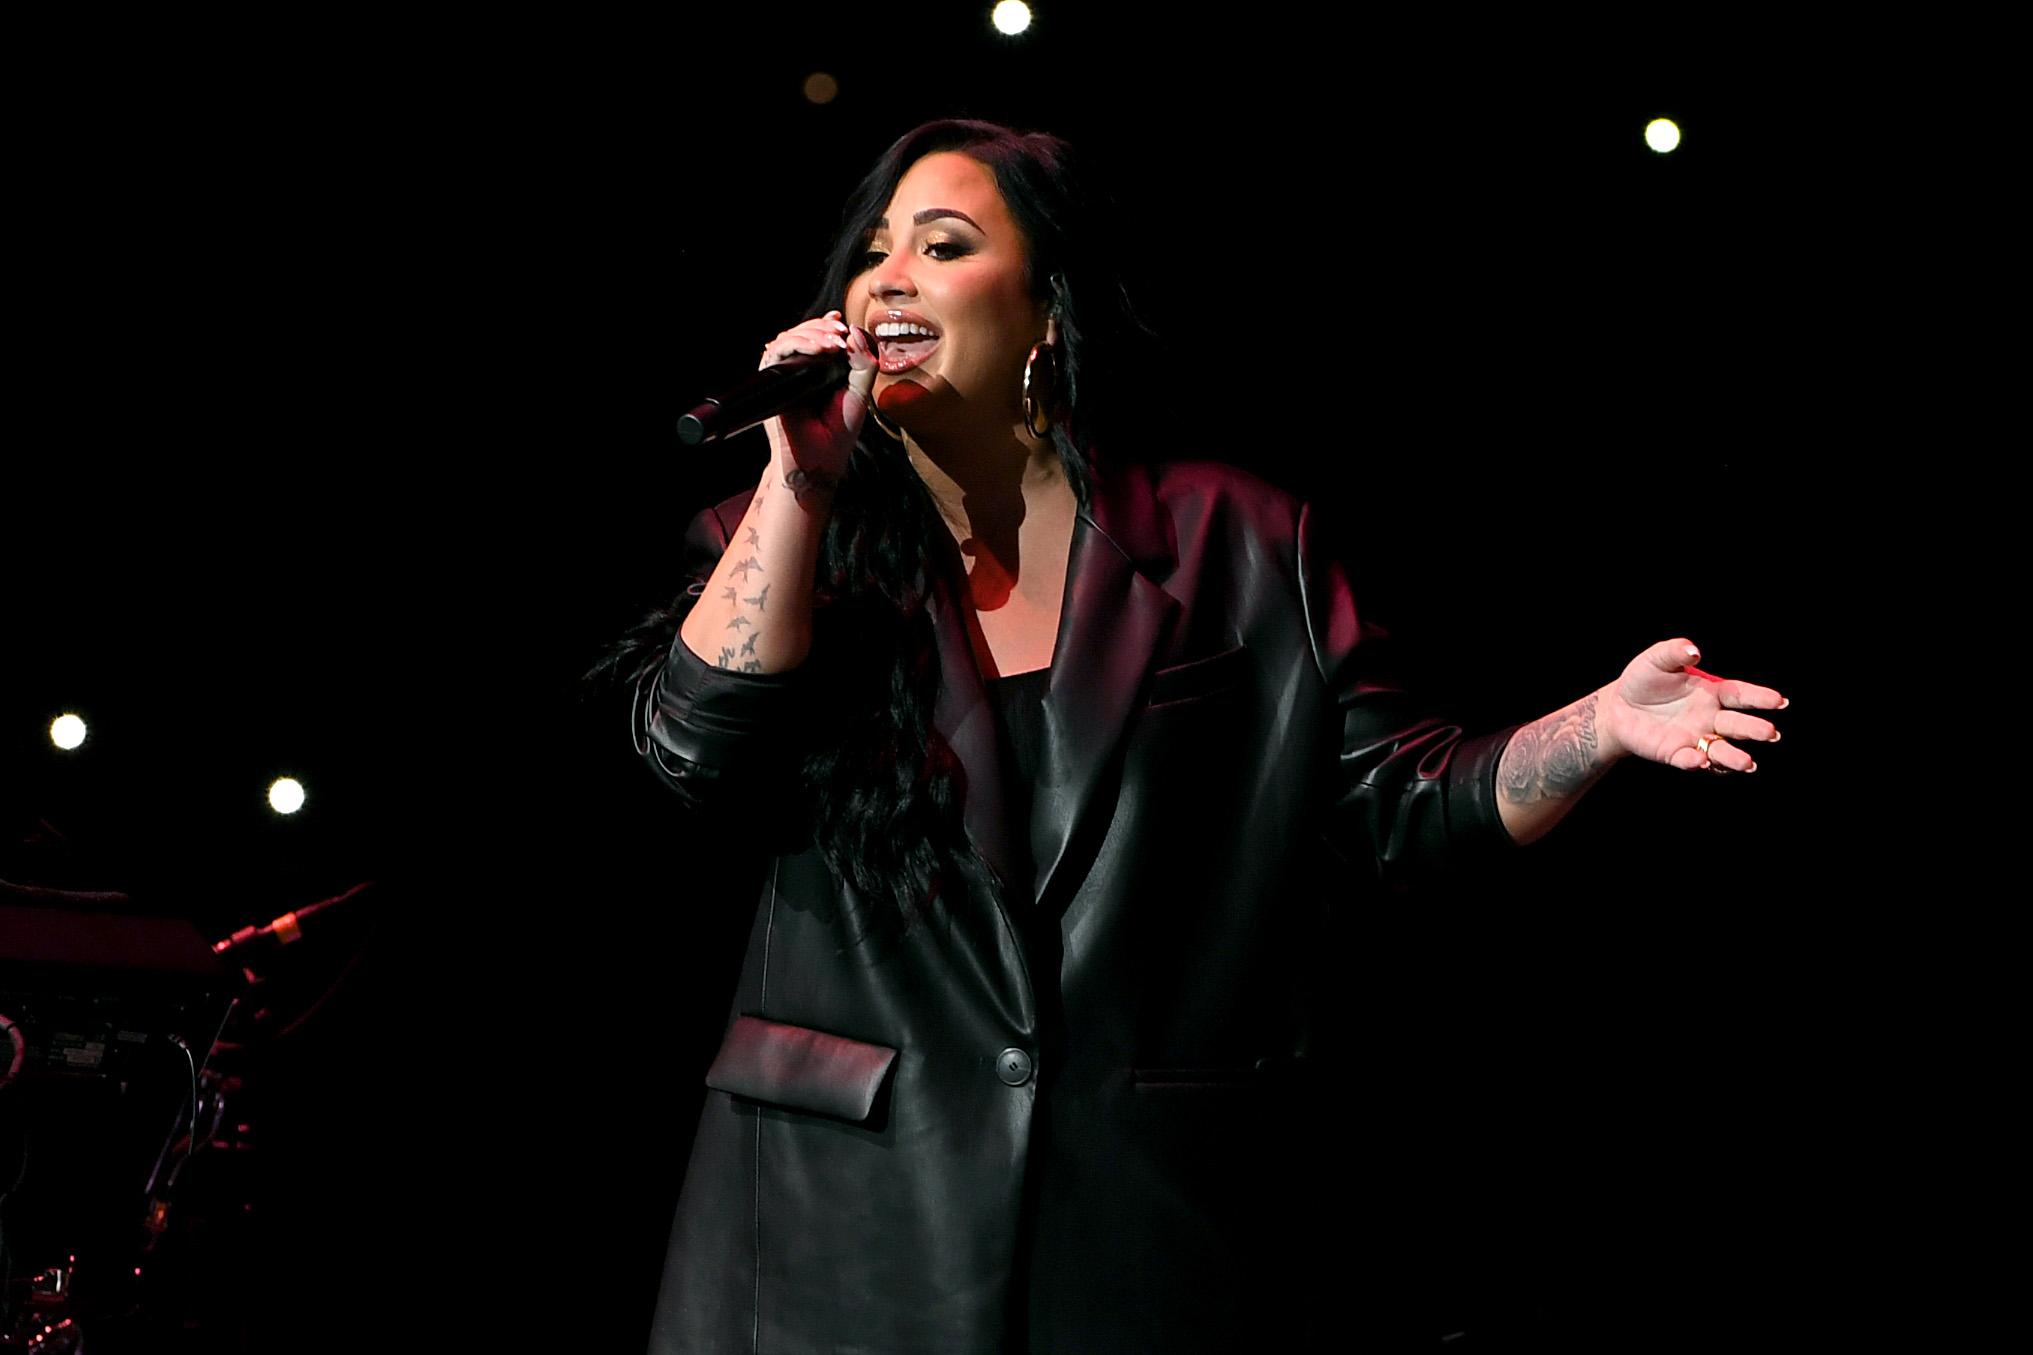 Demi Lovato and her new boyfriend go Instagram official!